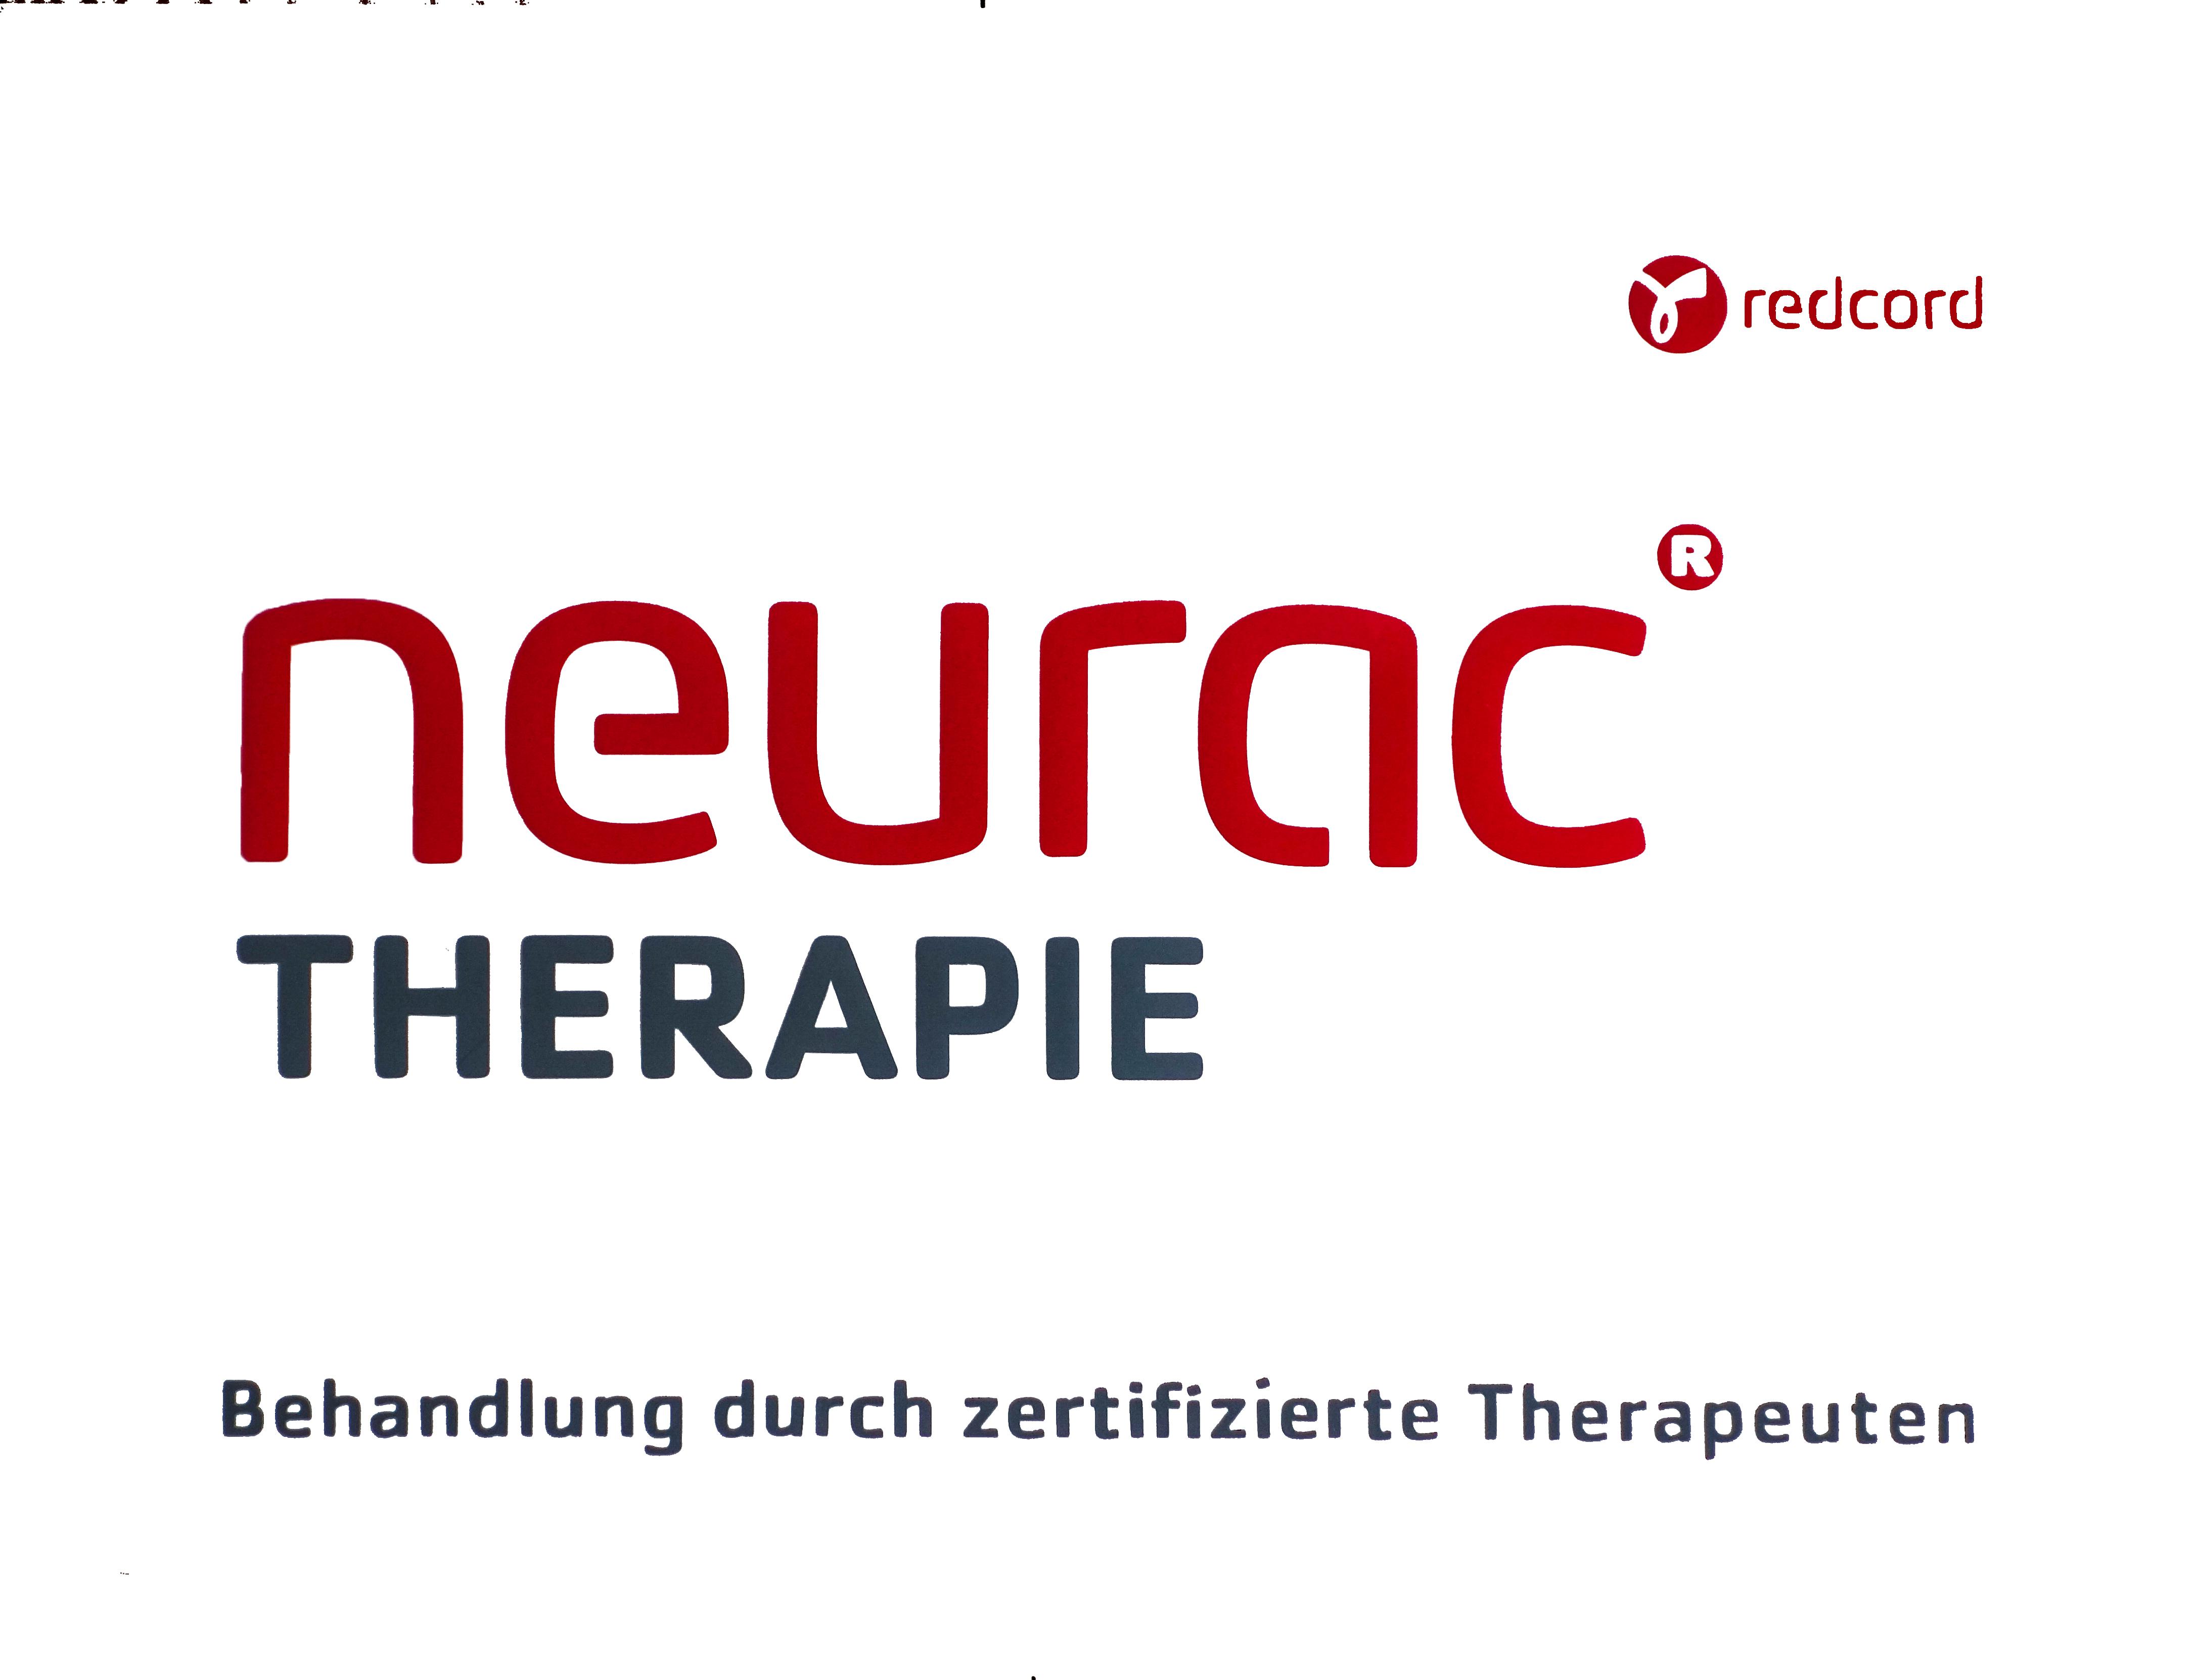 redcord neurac Therapie